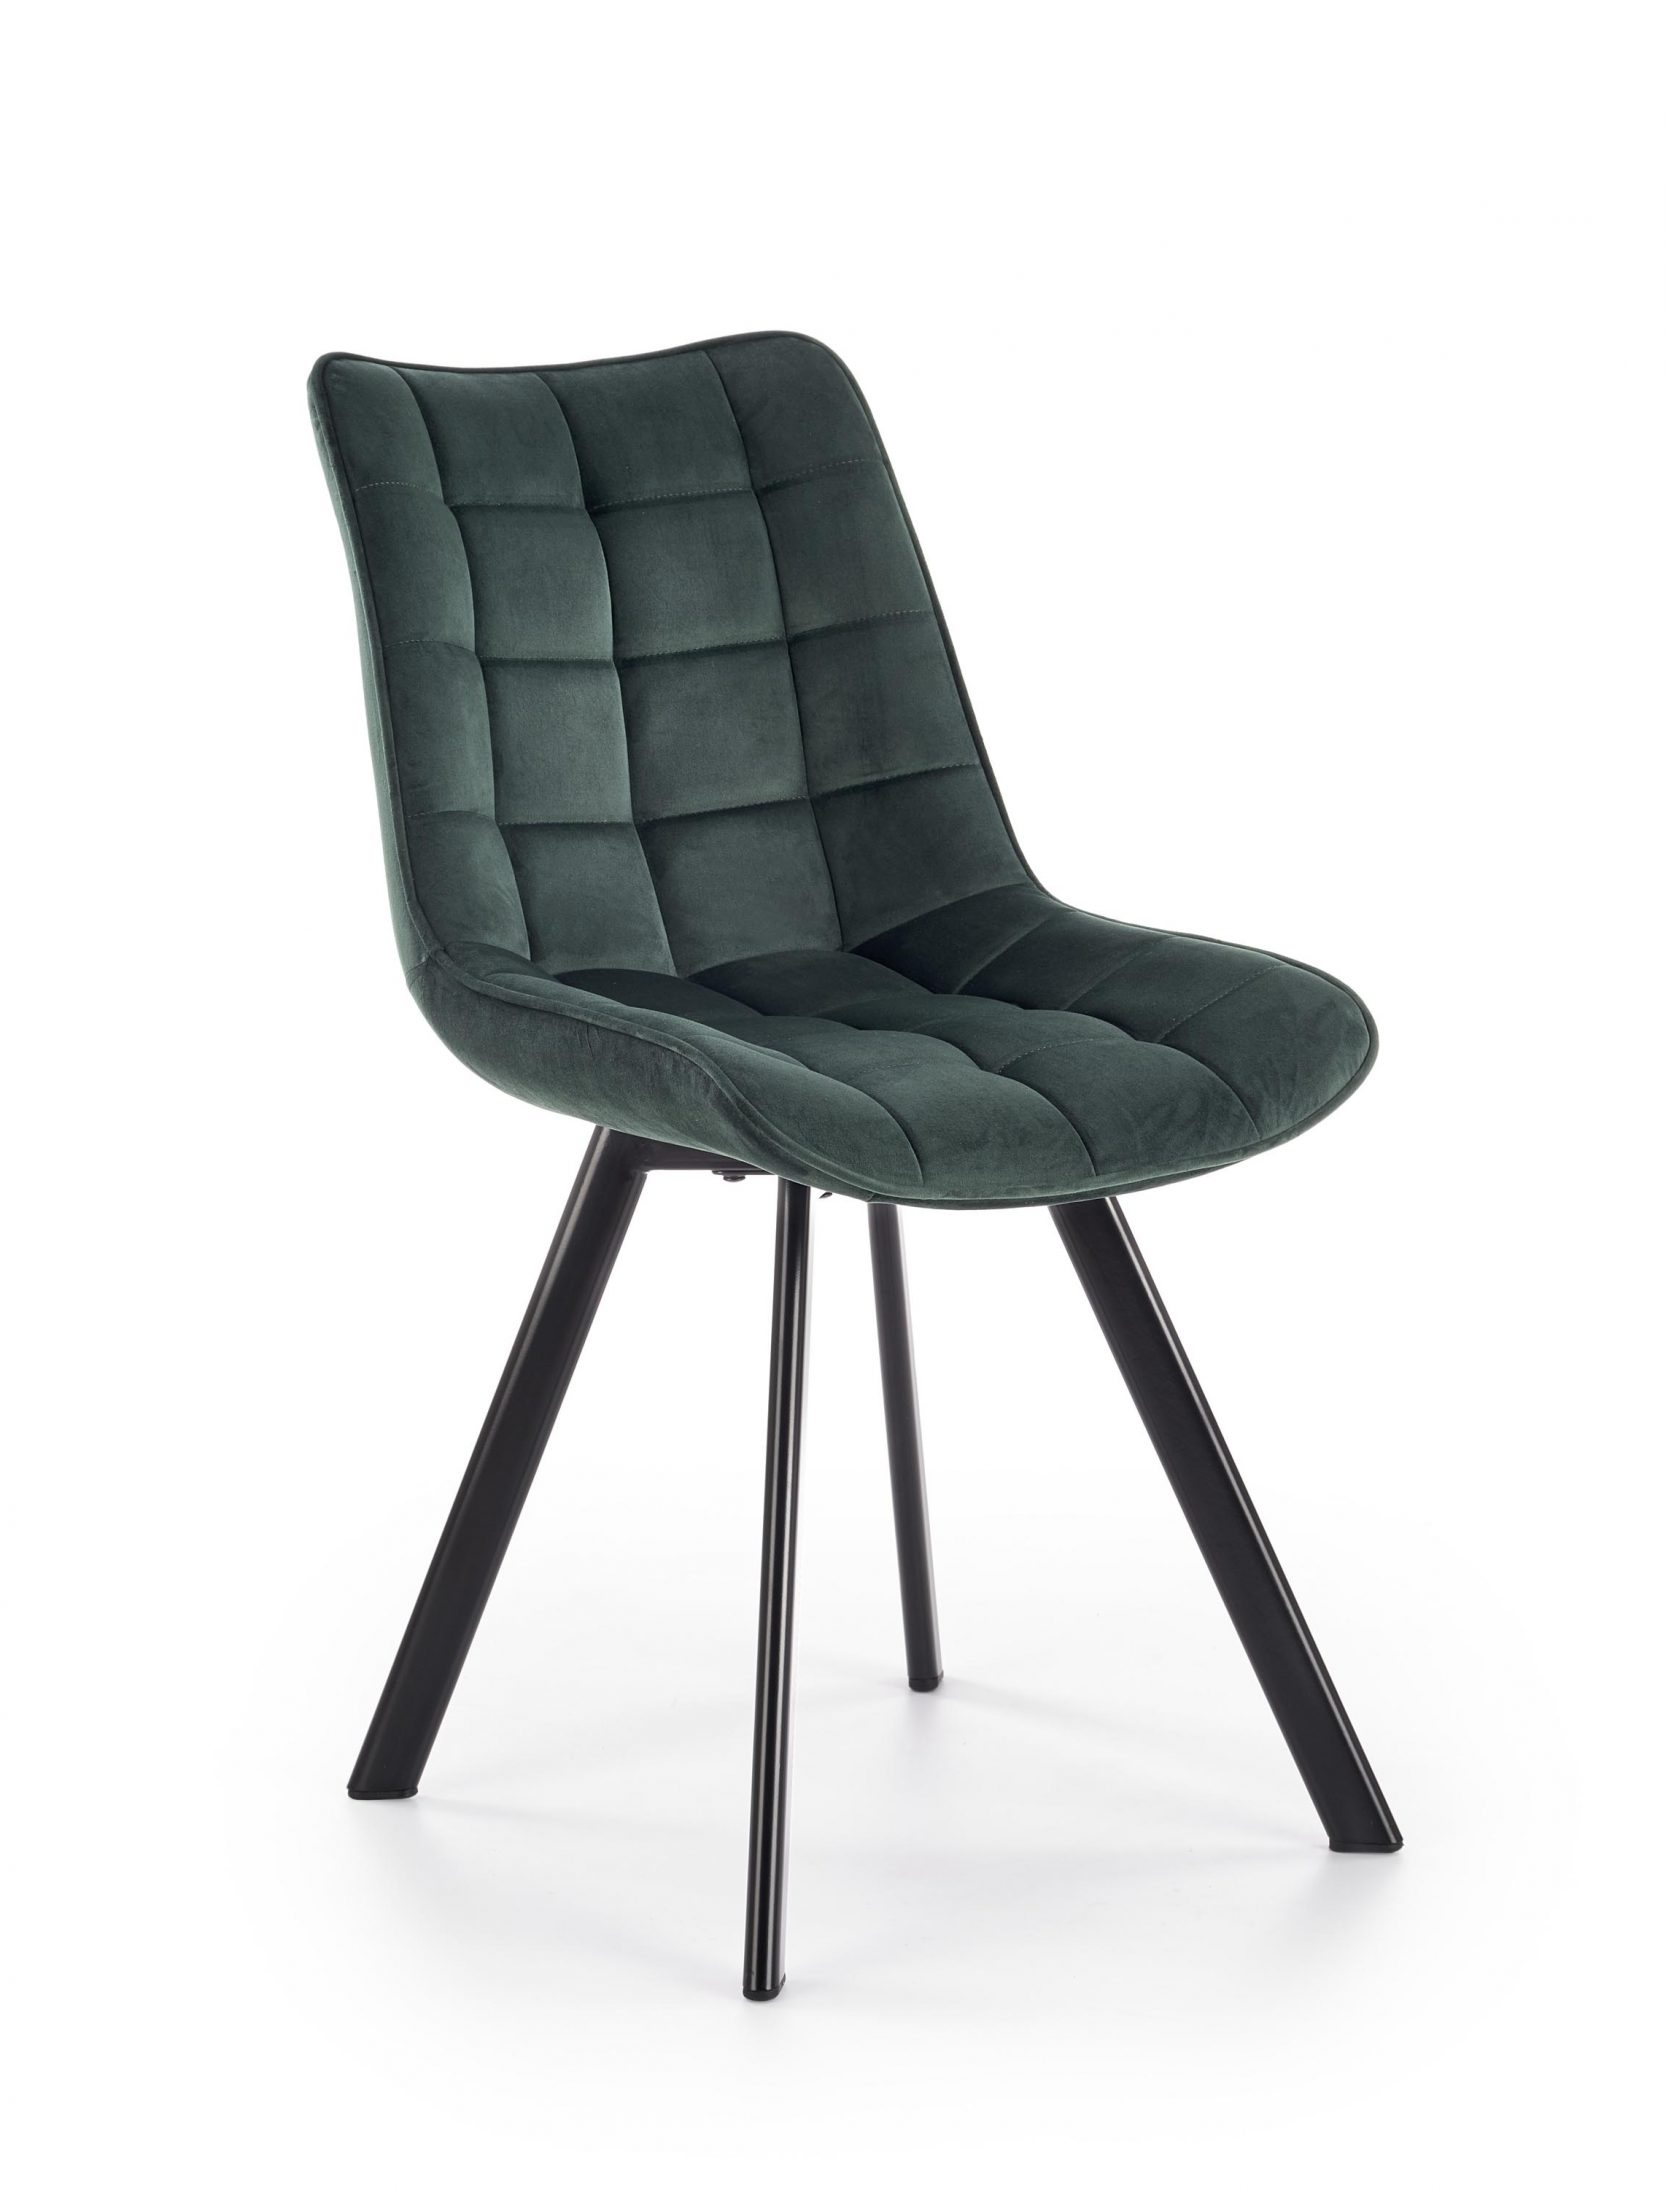 Scaun tapitat cu stofa, cu picioare metalice K332 Verde inchis / Negru, l46xA61xH84 cm